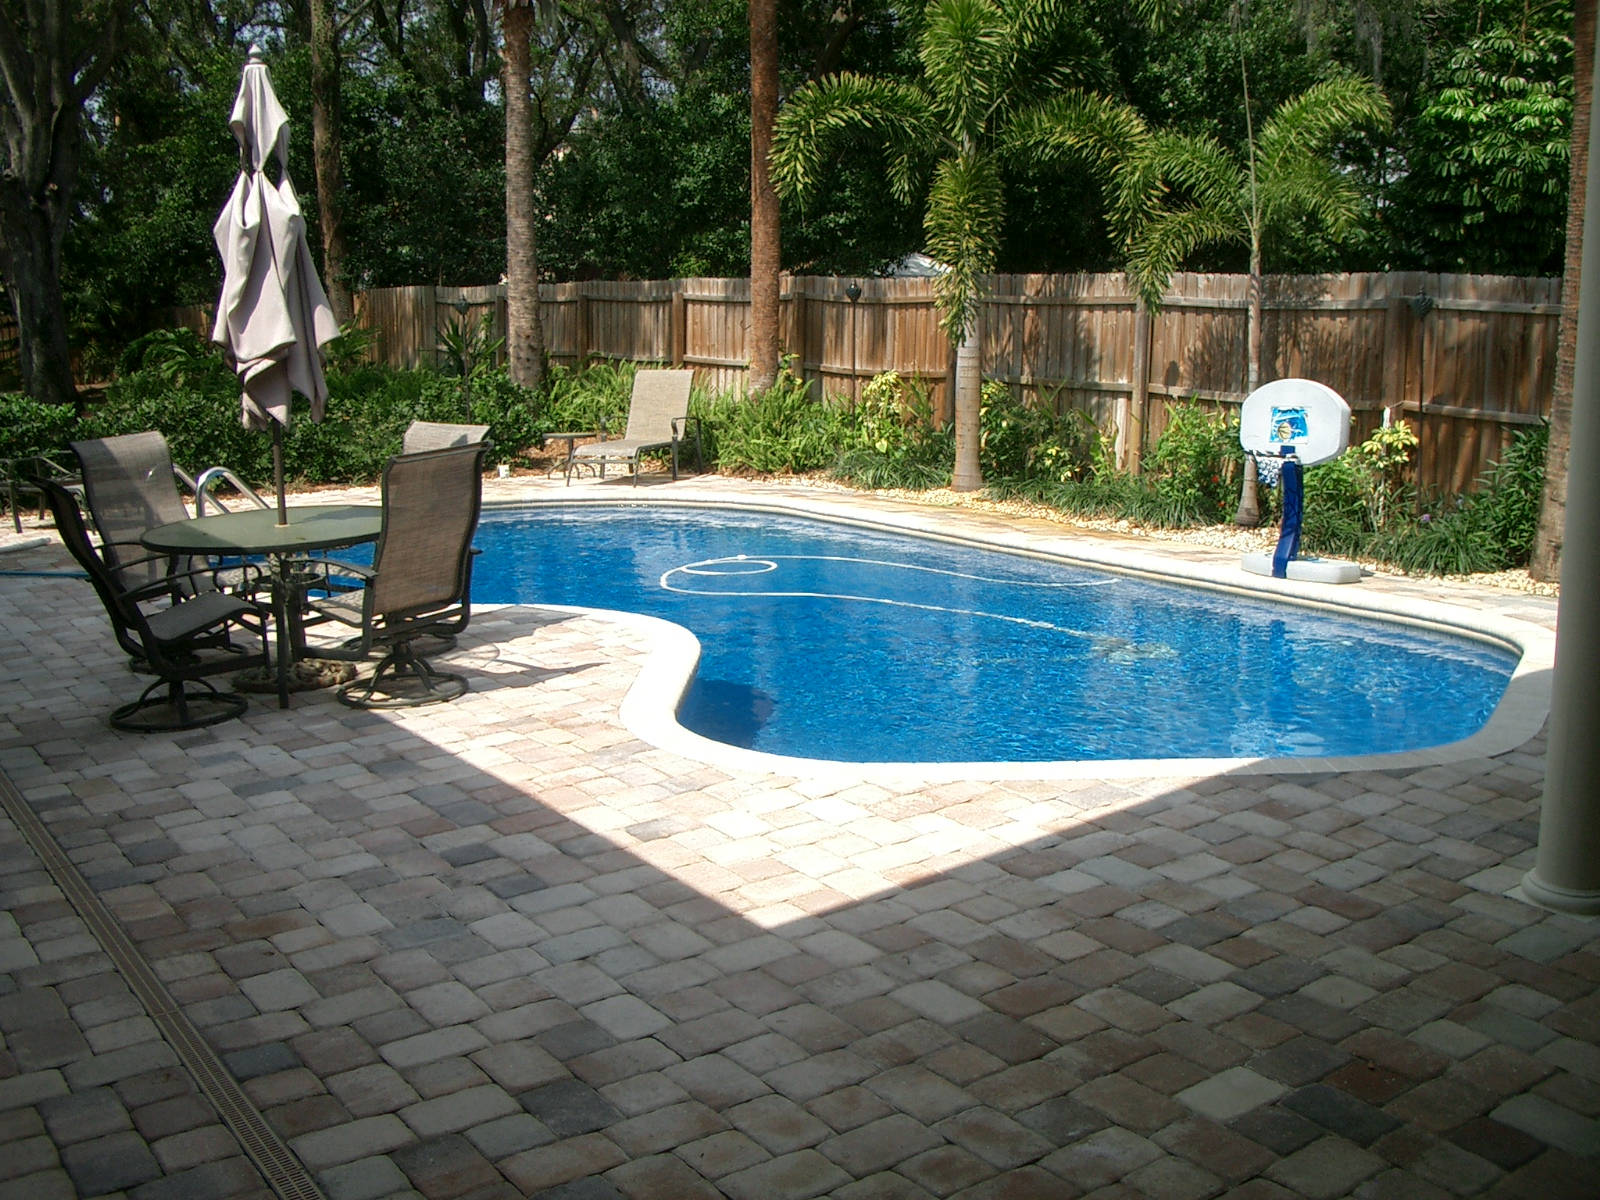 Backyard-Landscaping-Ideas-Swimming-Pool-Design-Homesthetics-35